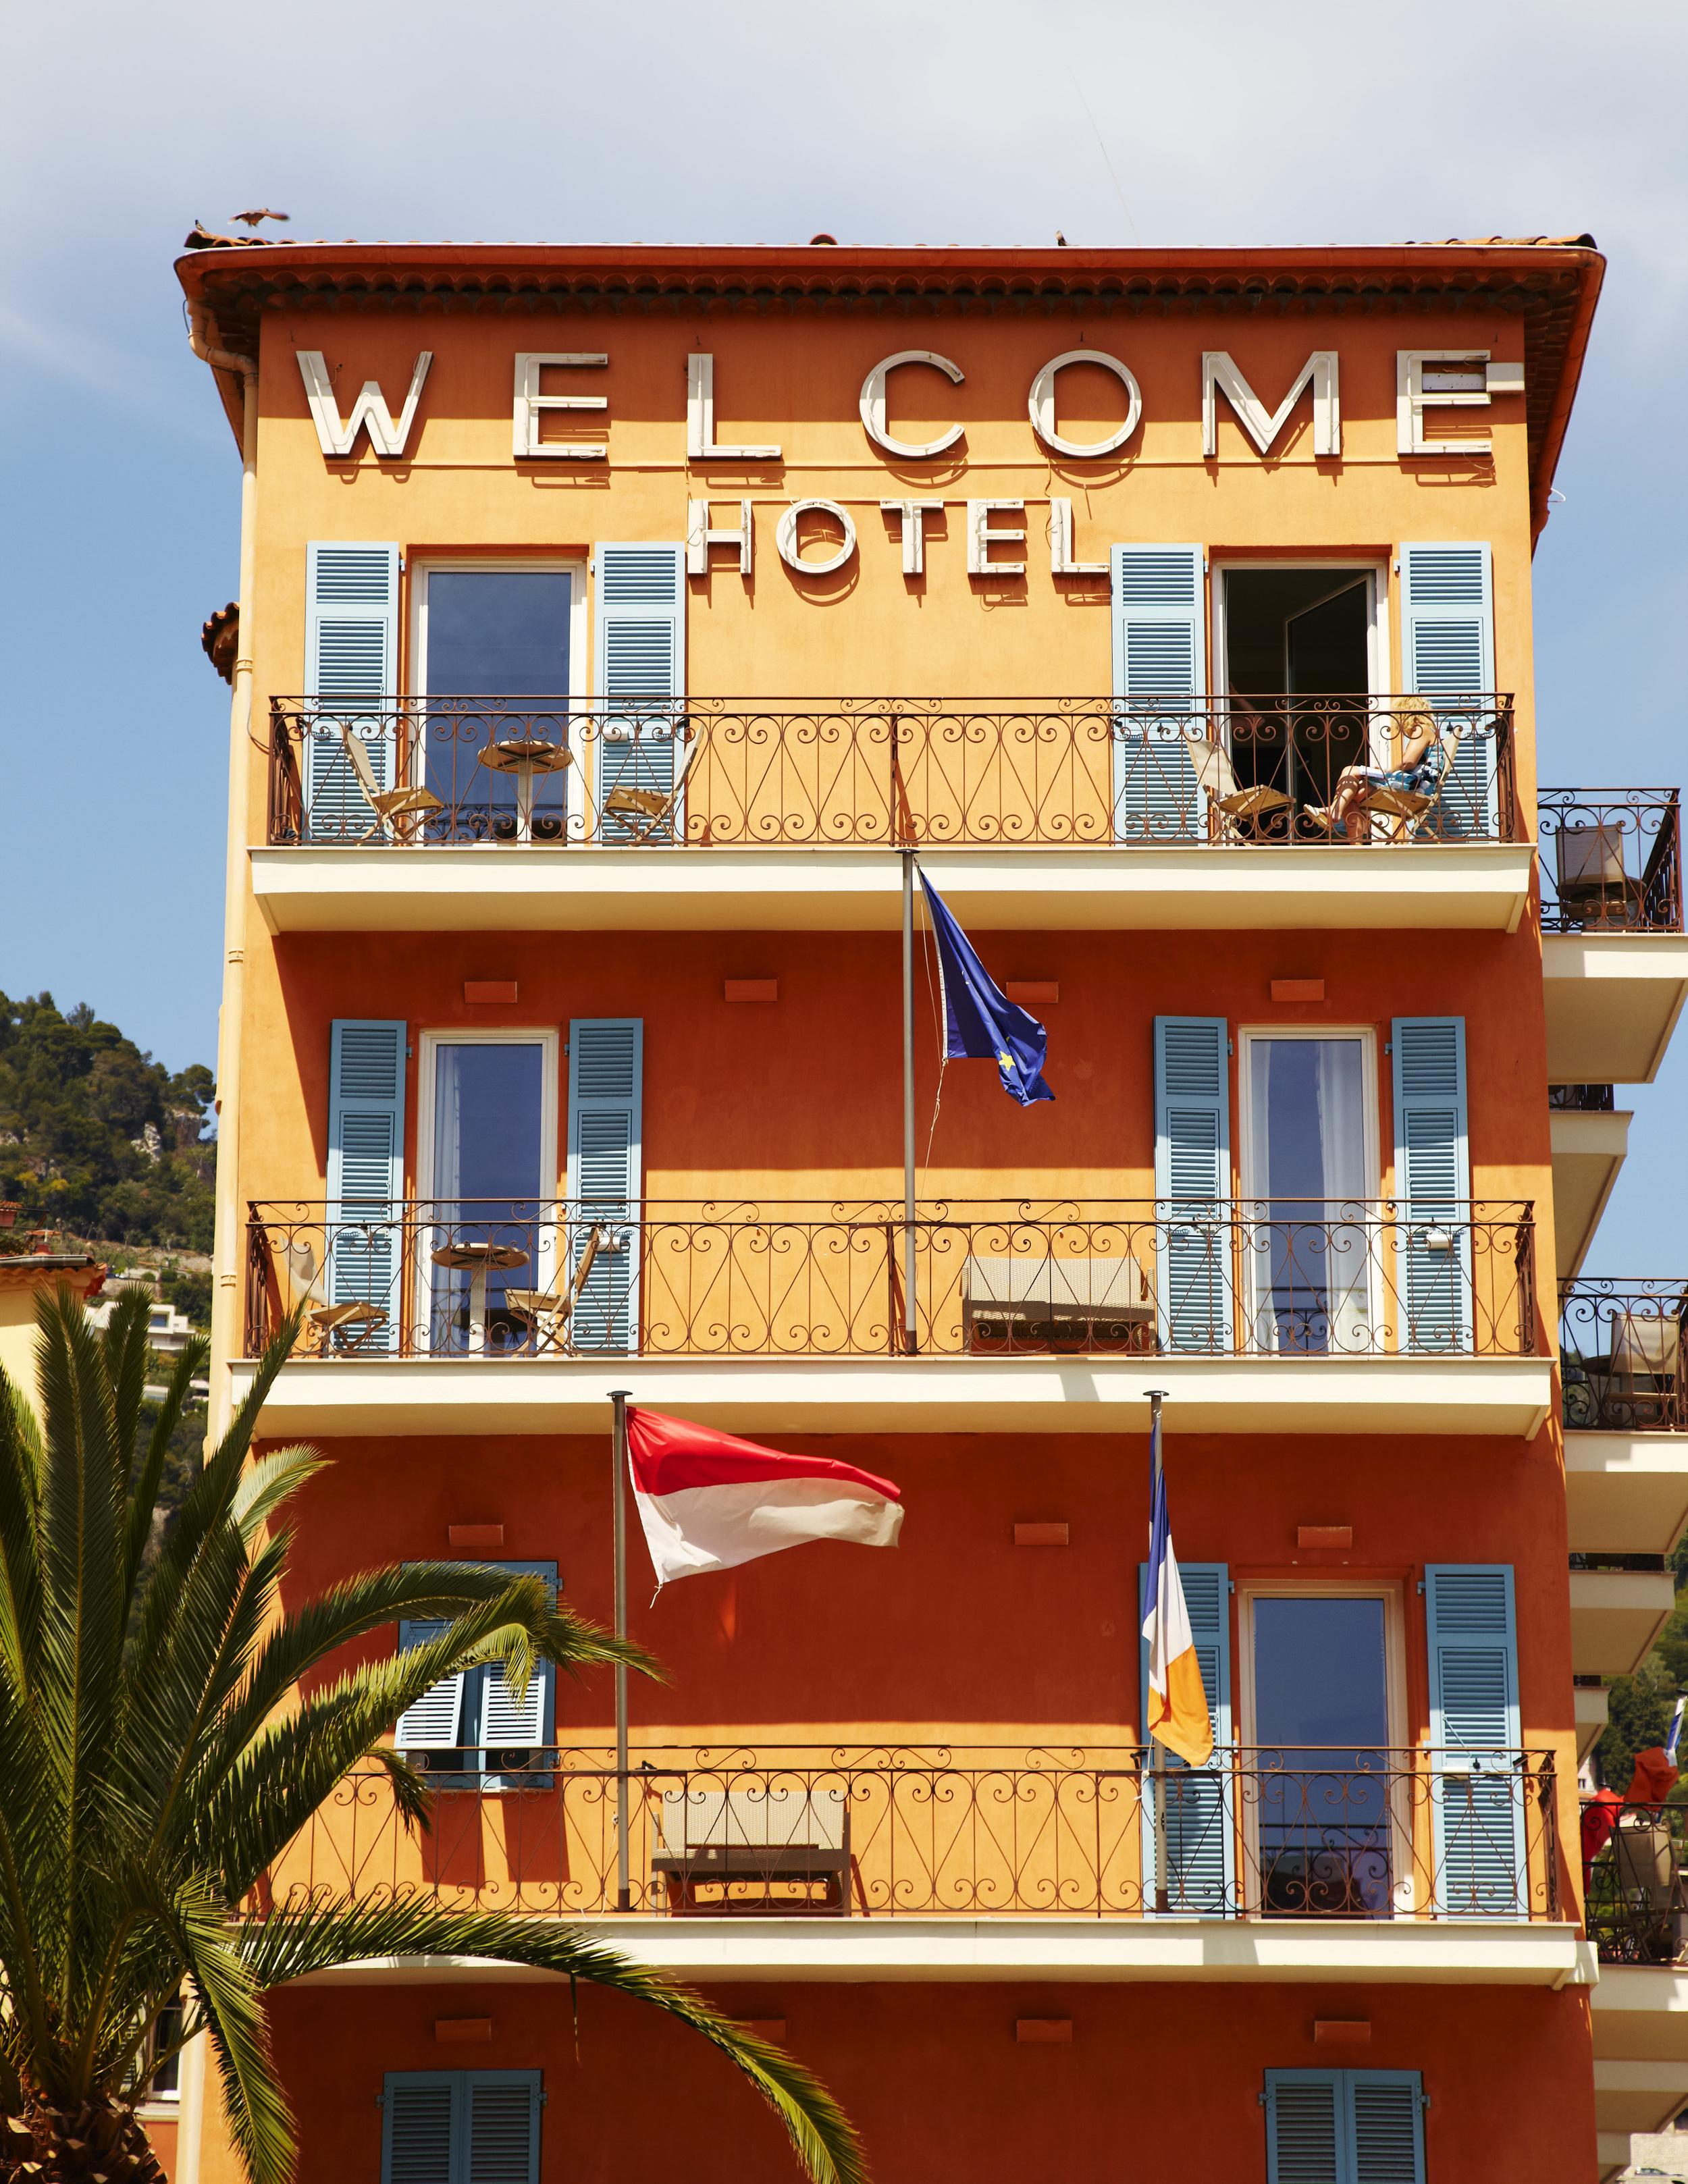 welcomehotel.jpg